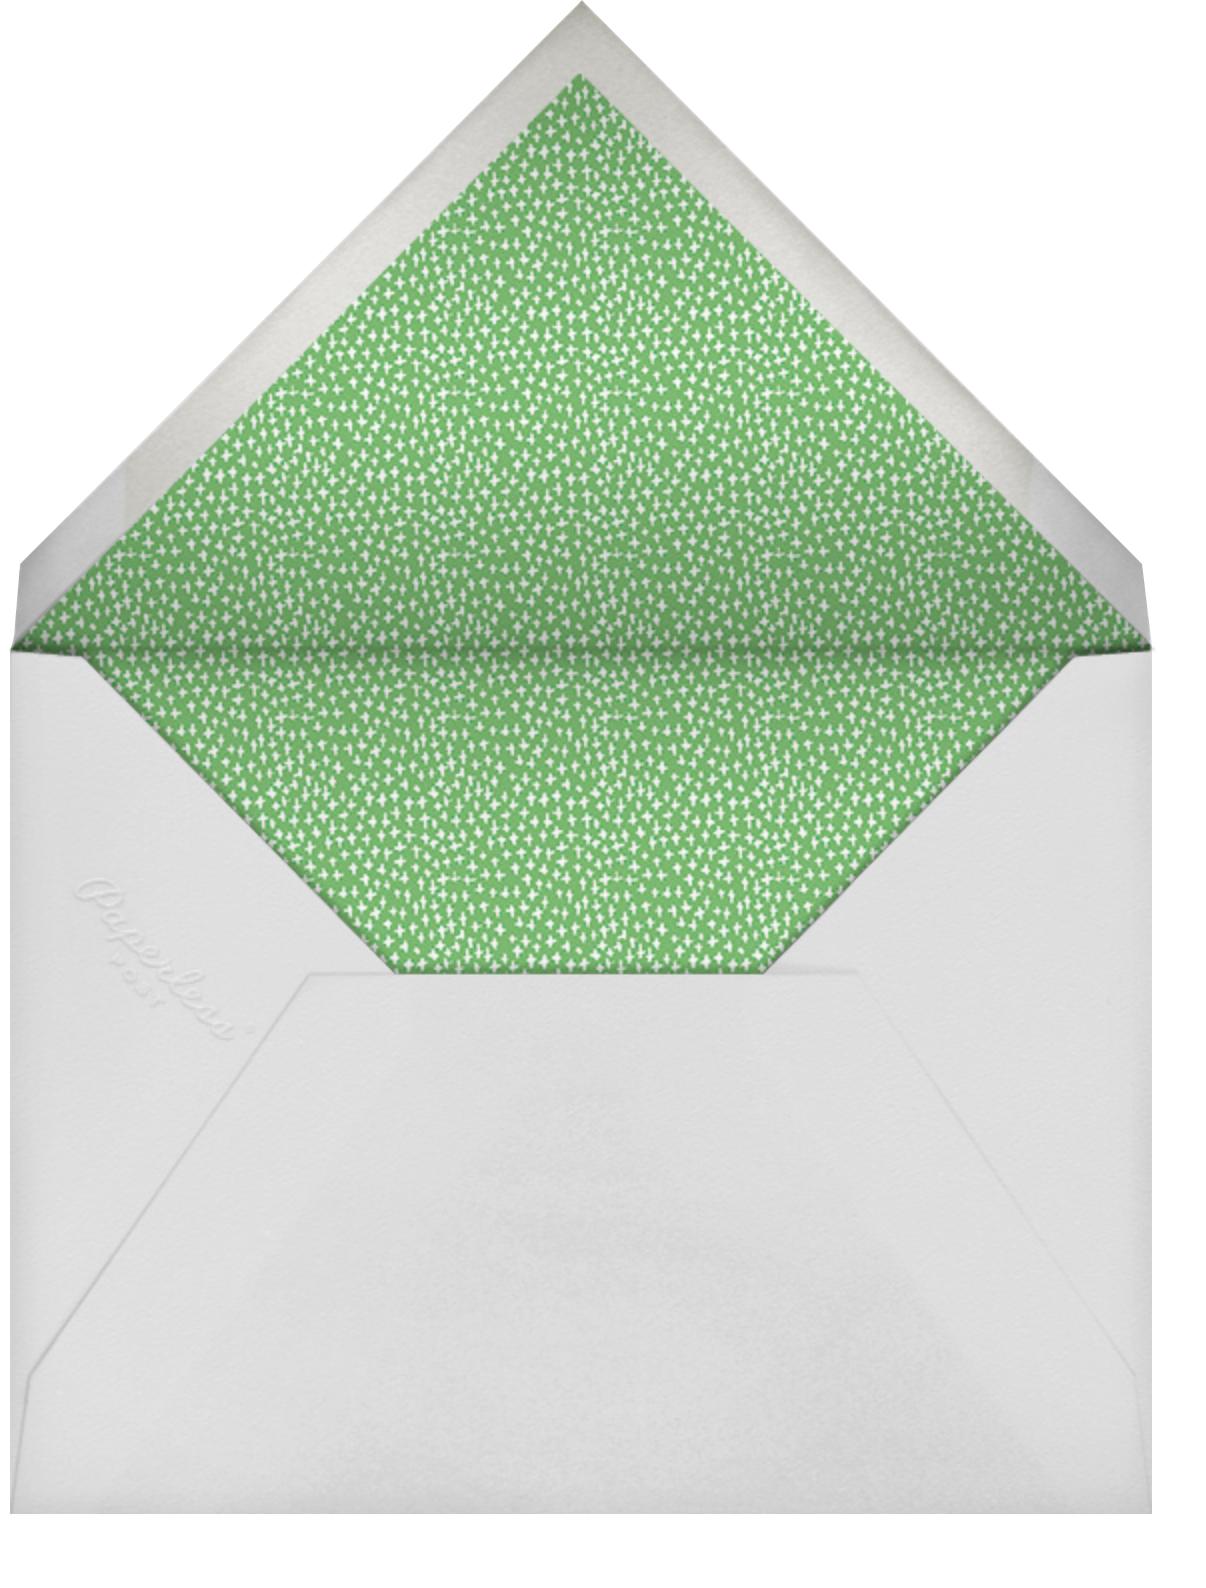 Among the Daisies - Citrus - Mr. Boddington's Studio - Baby shower - envelope back